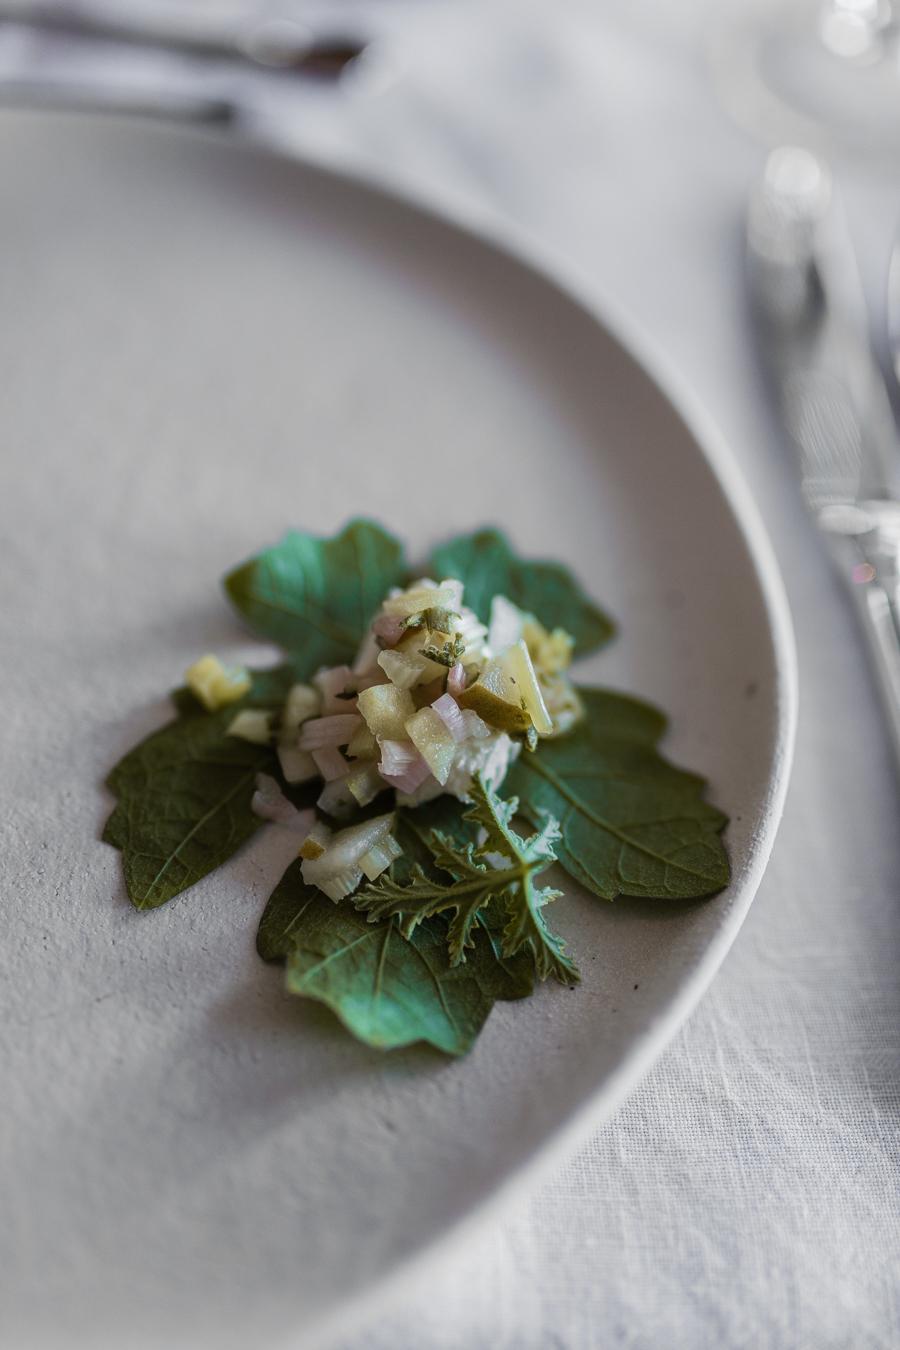 Sinnika_Harms_Adelaster_Food_Textures_IMG_2046.jpg